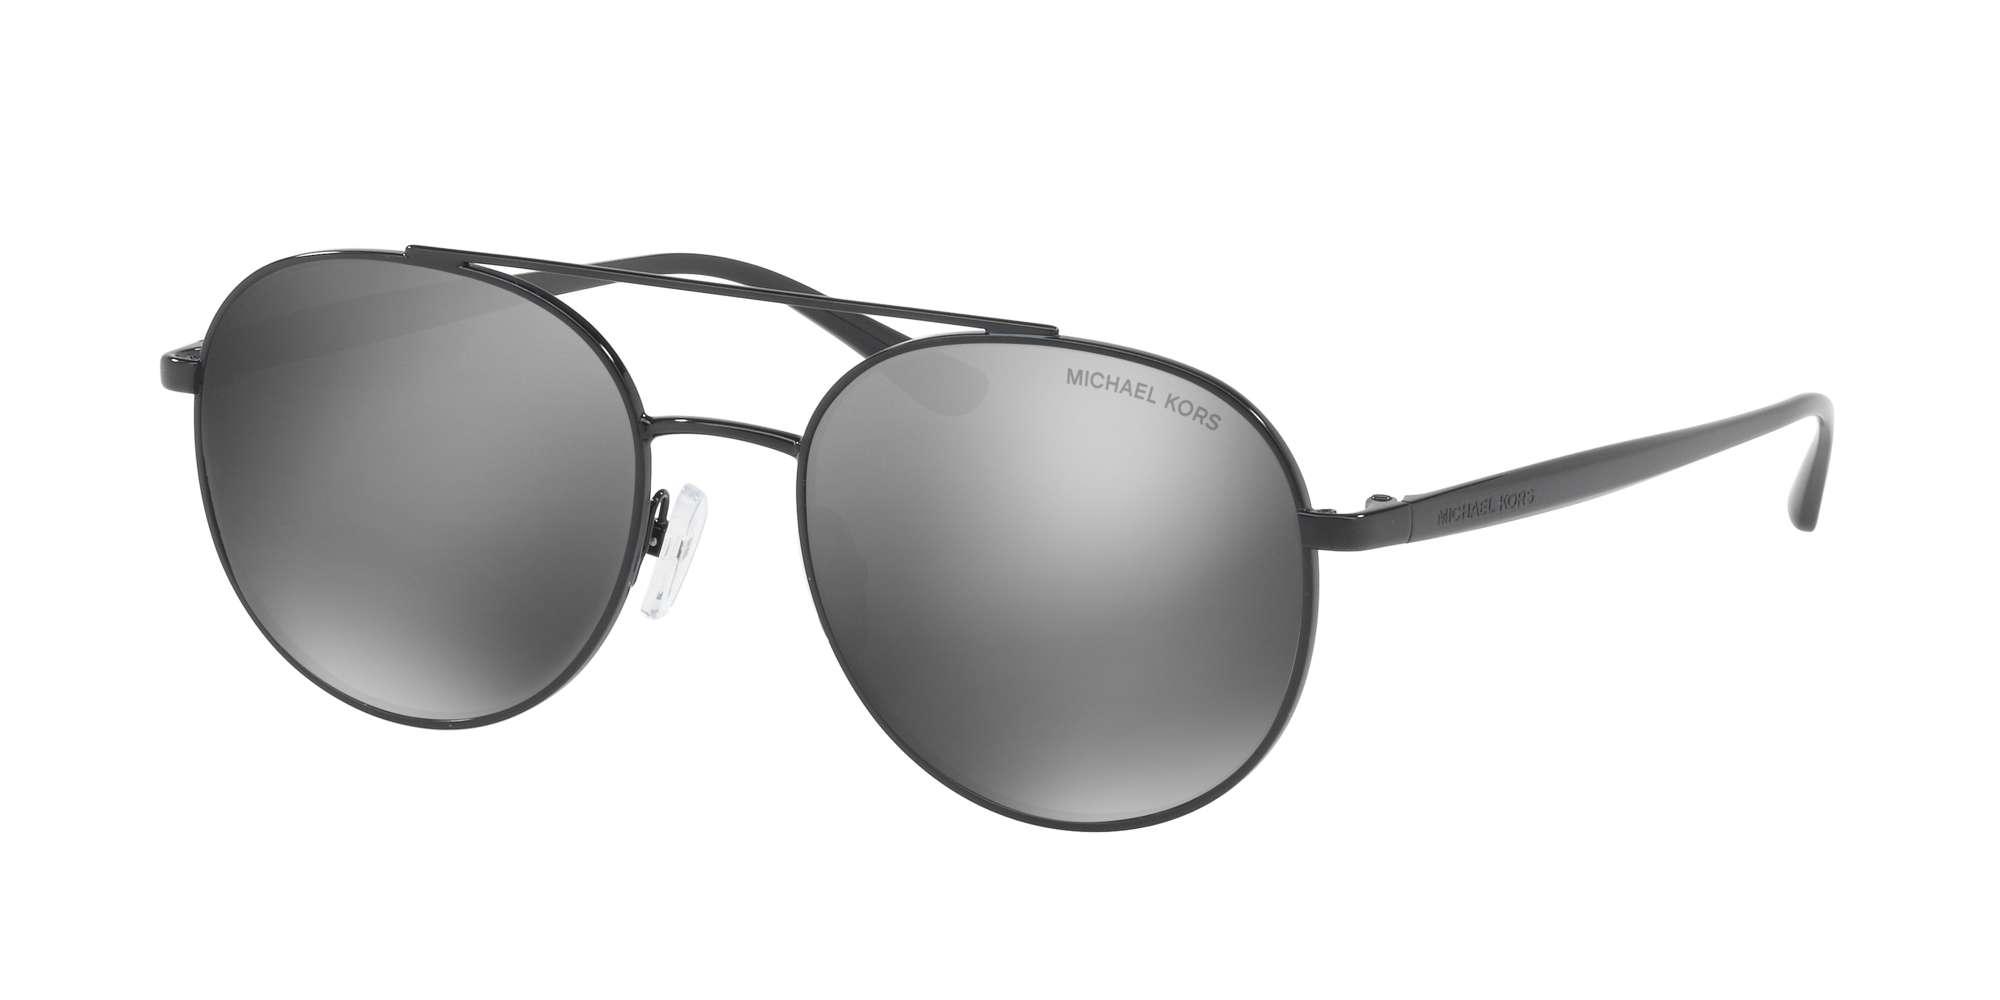 BLACK / GUNMETAL MIRROR lenses